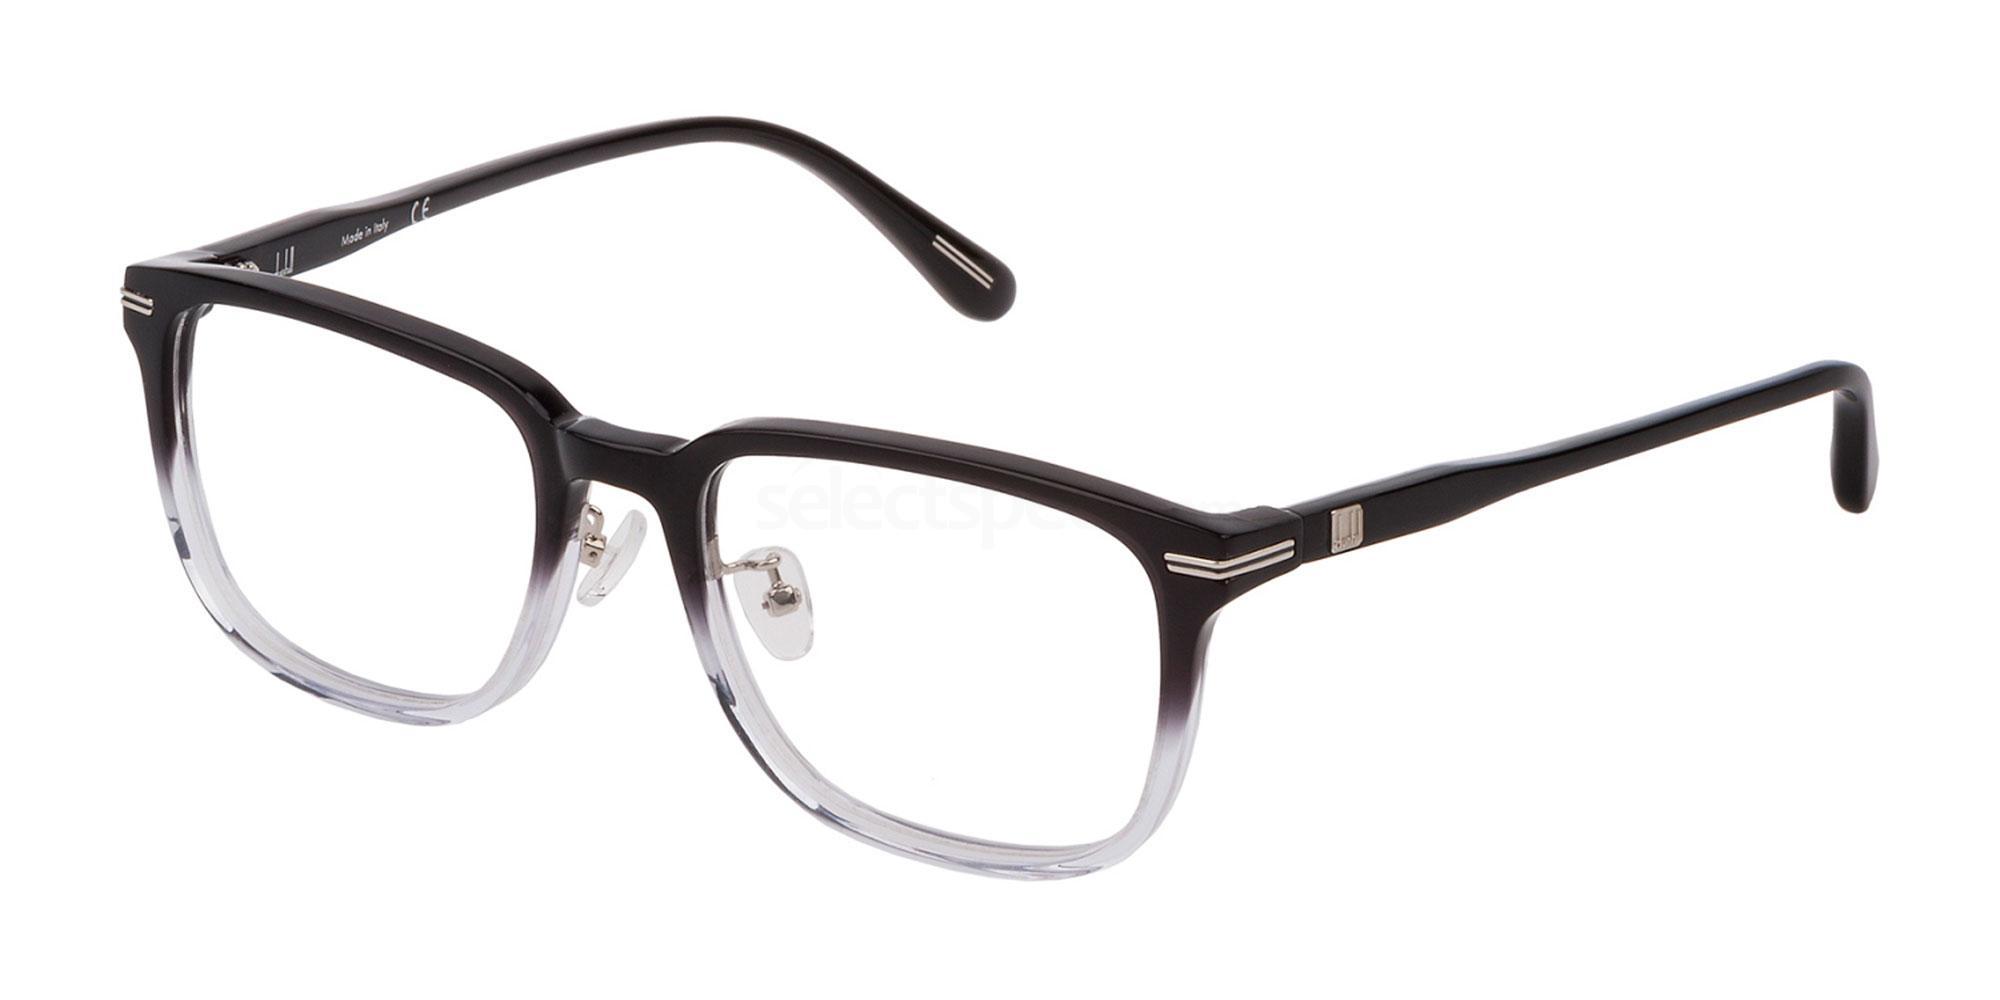 0W40 VDH141G Glasses, Dunhill London